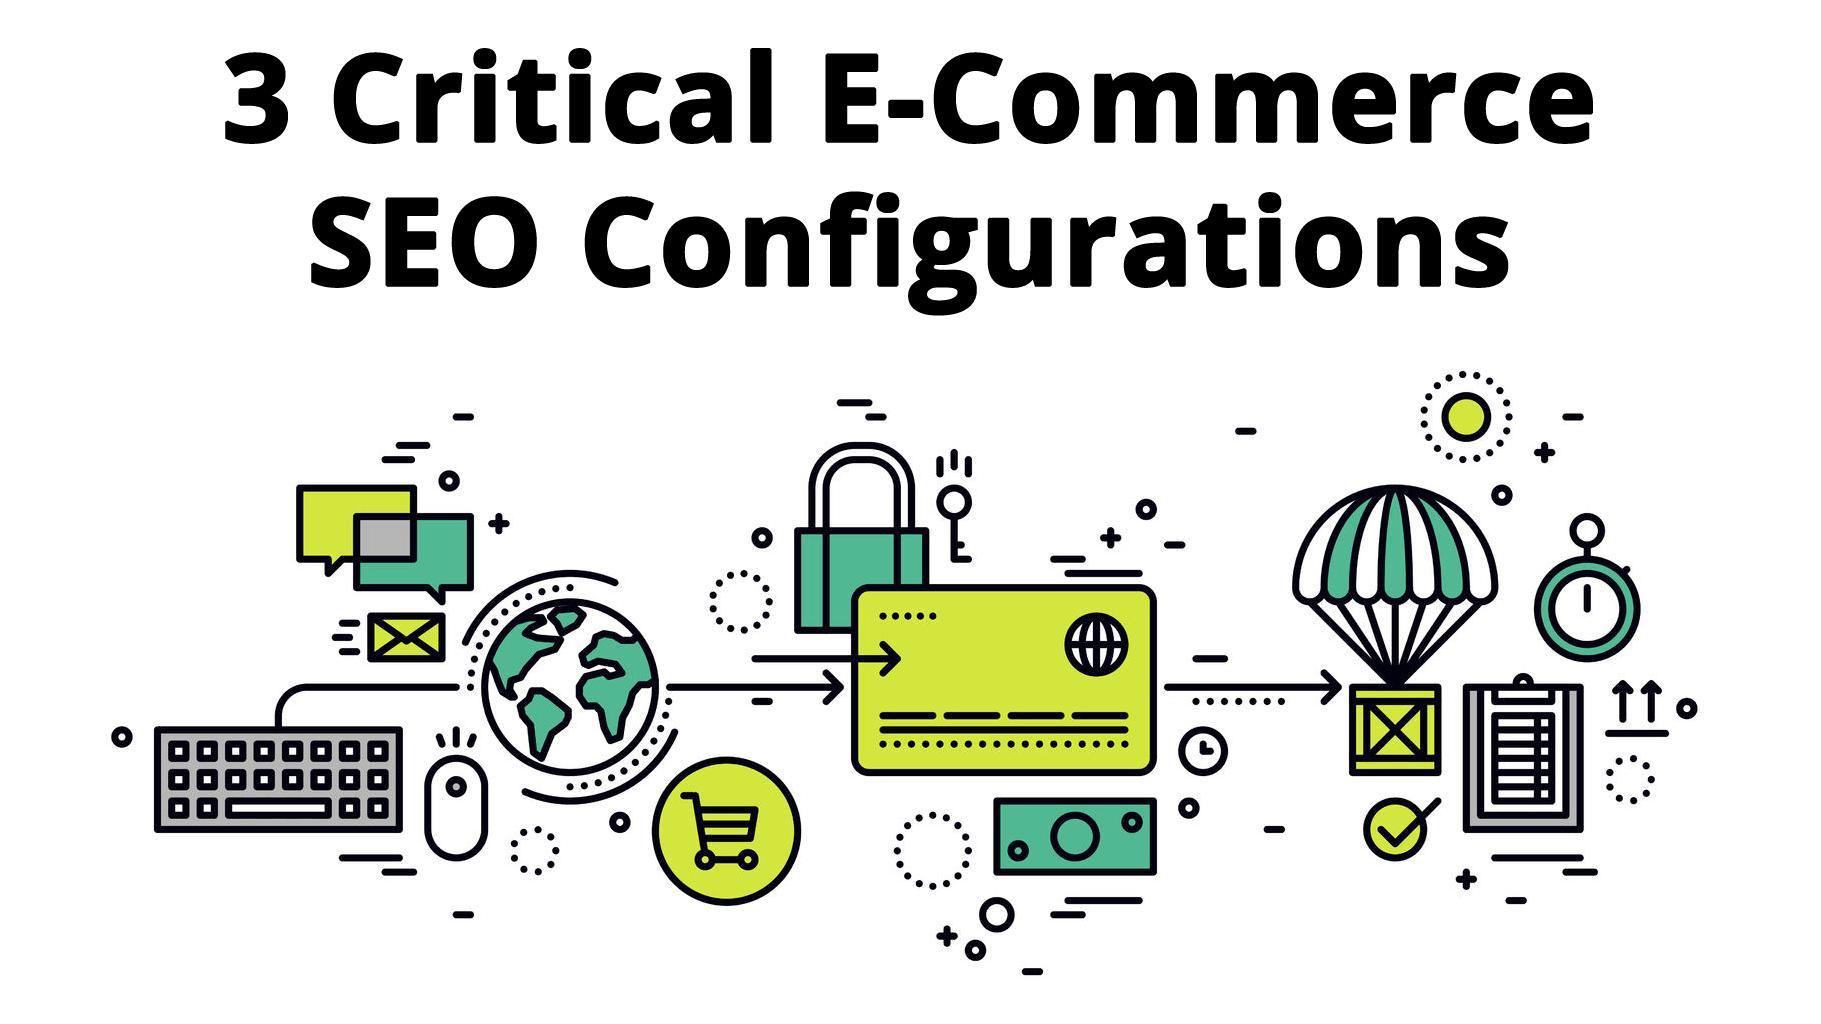 critical-ecommerce-configurations-seo